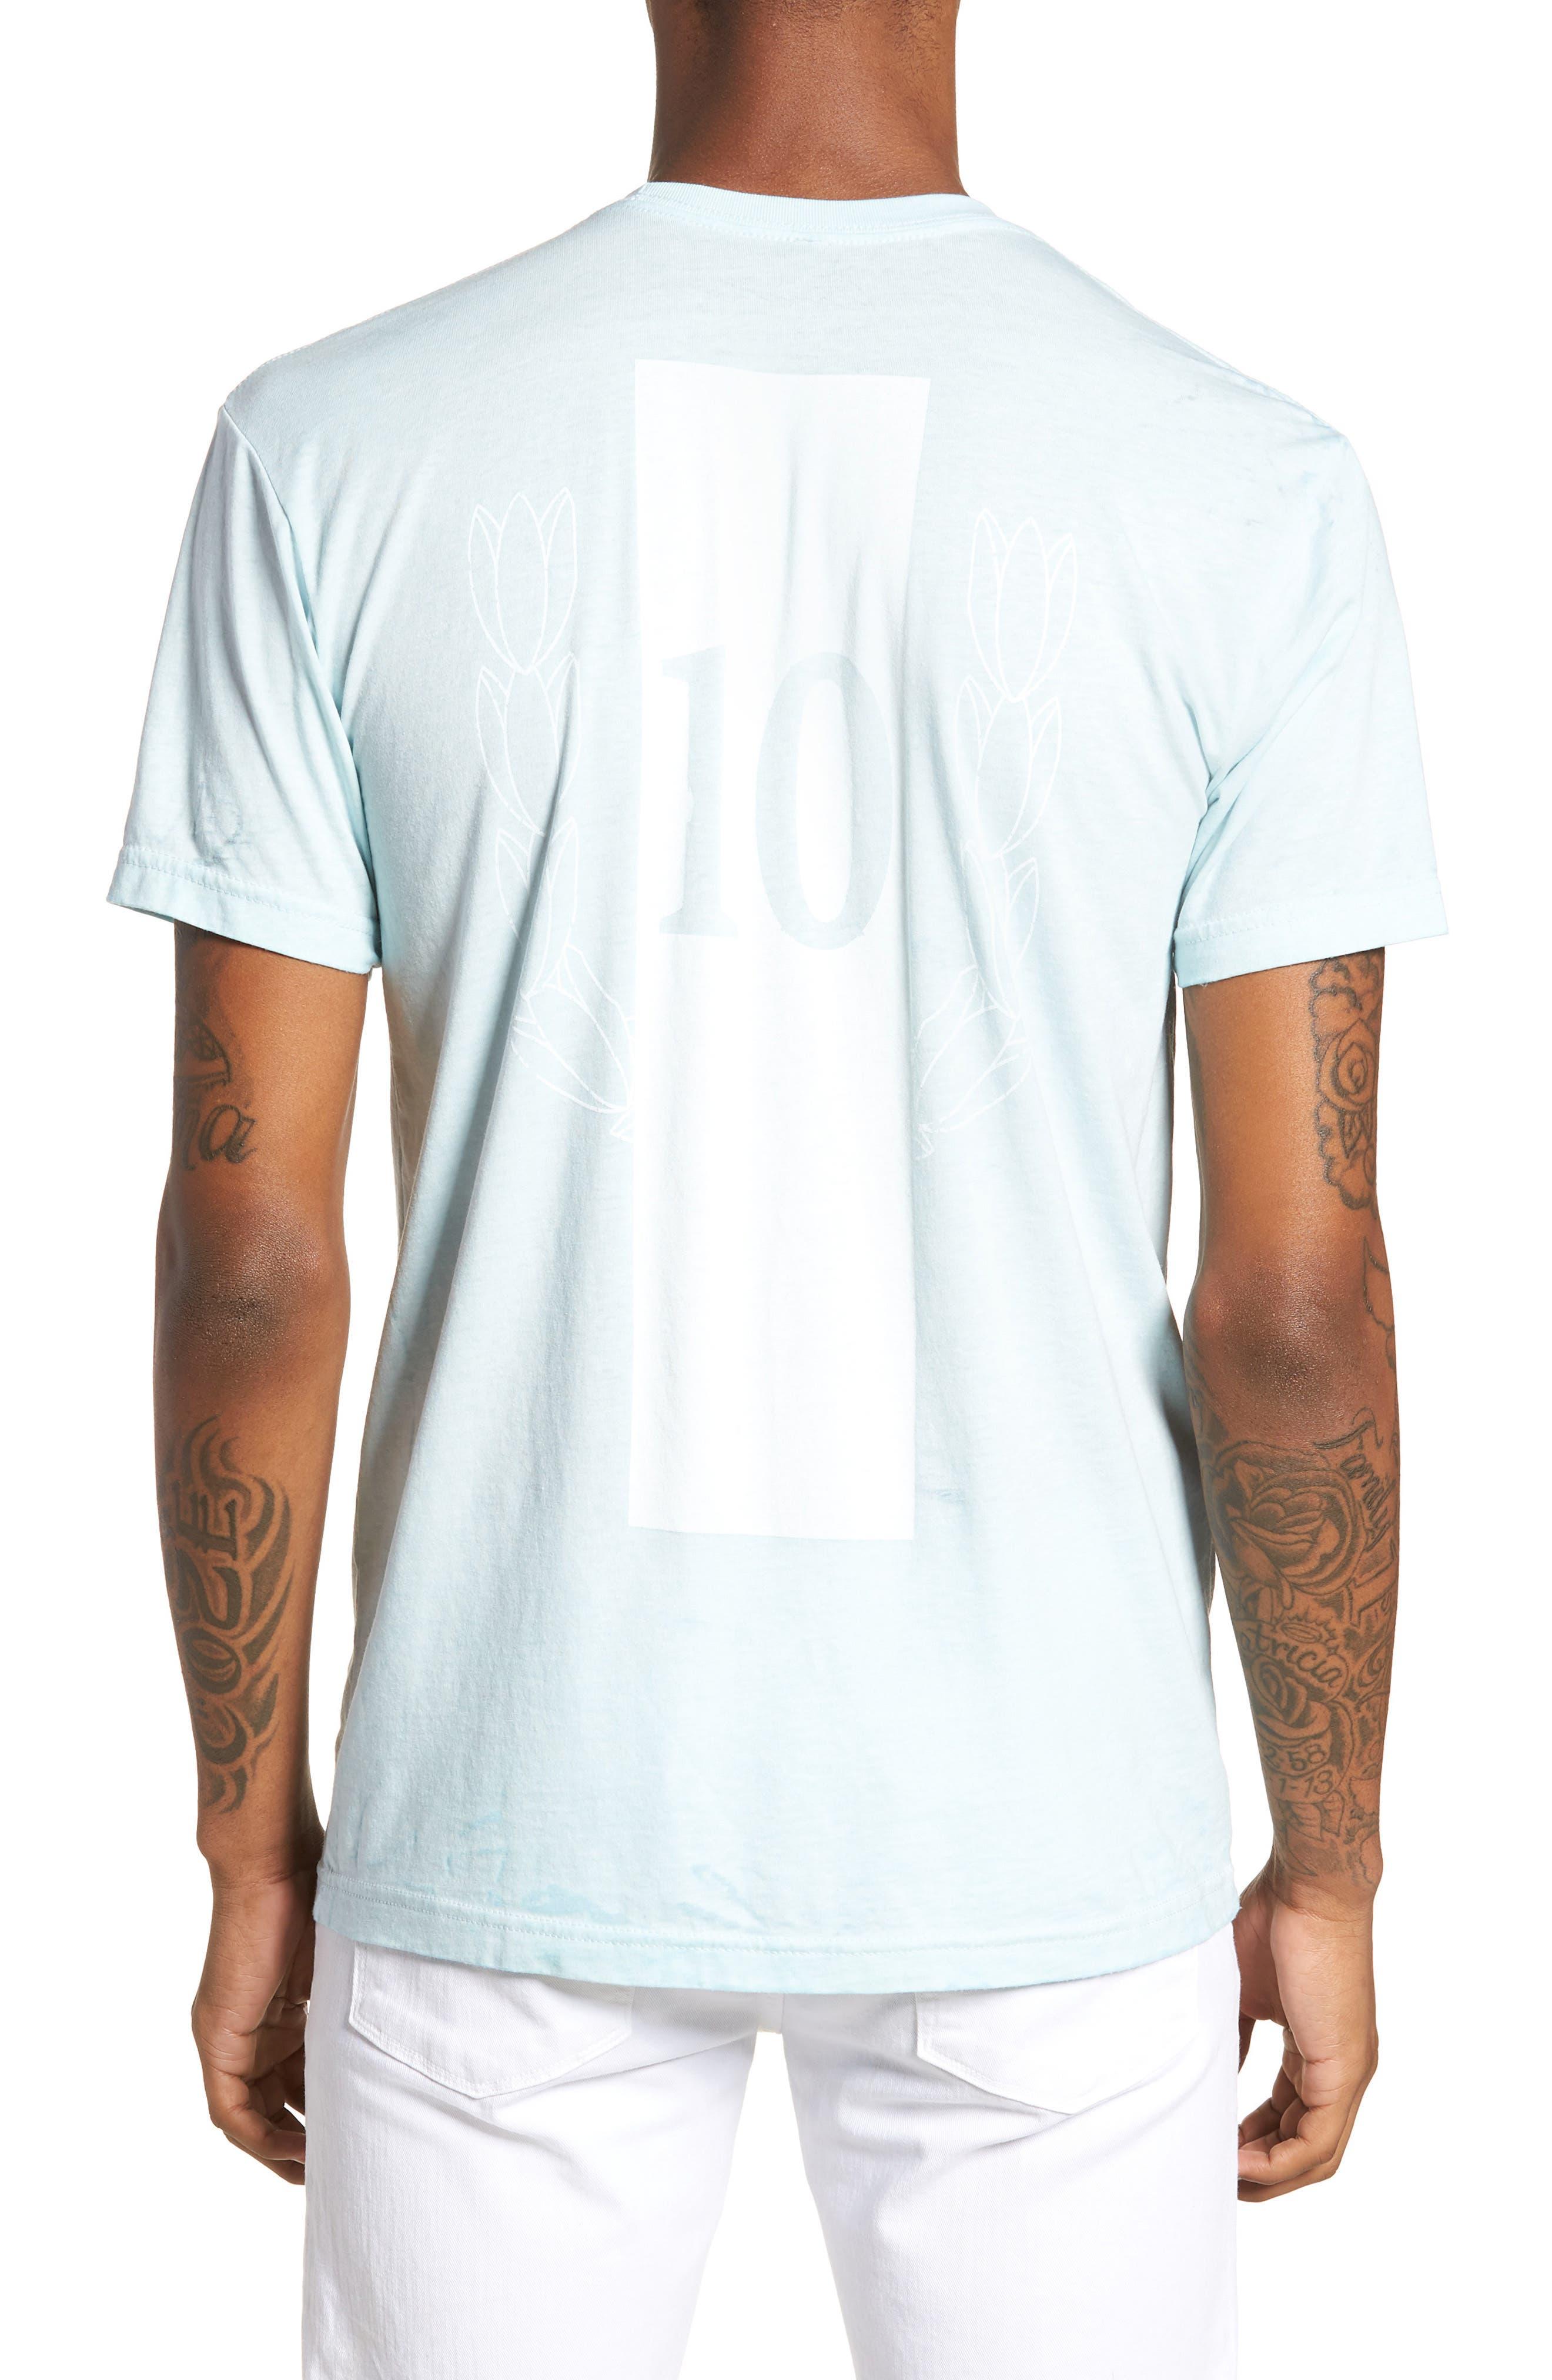 Kintetix Argentina T-Shirt,                             Alternate thumbnail 2, color,                             Sky Blue